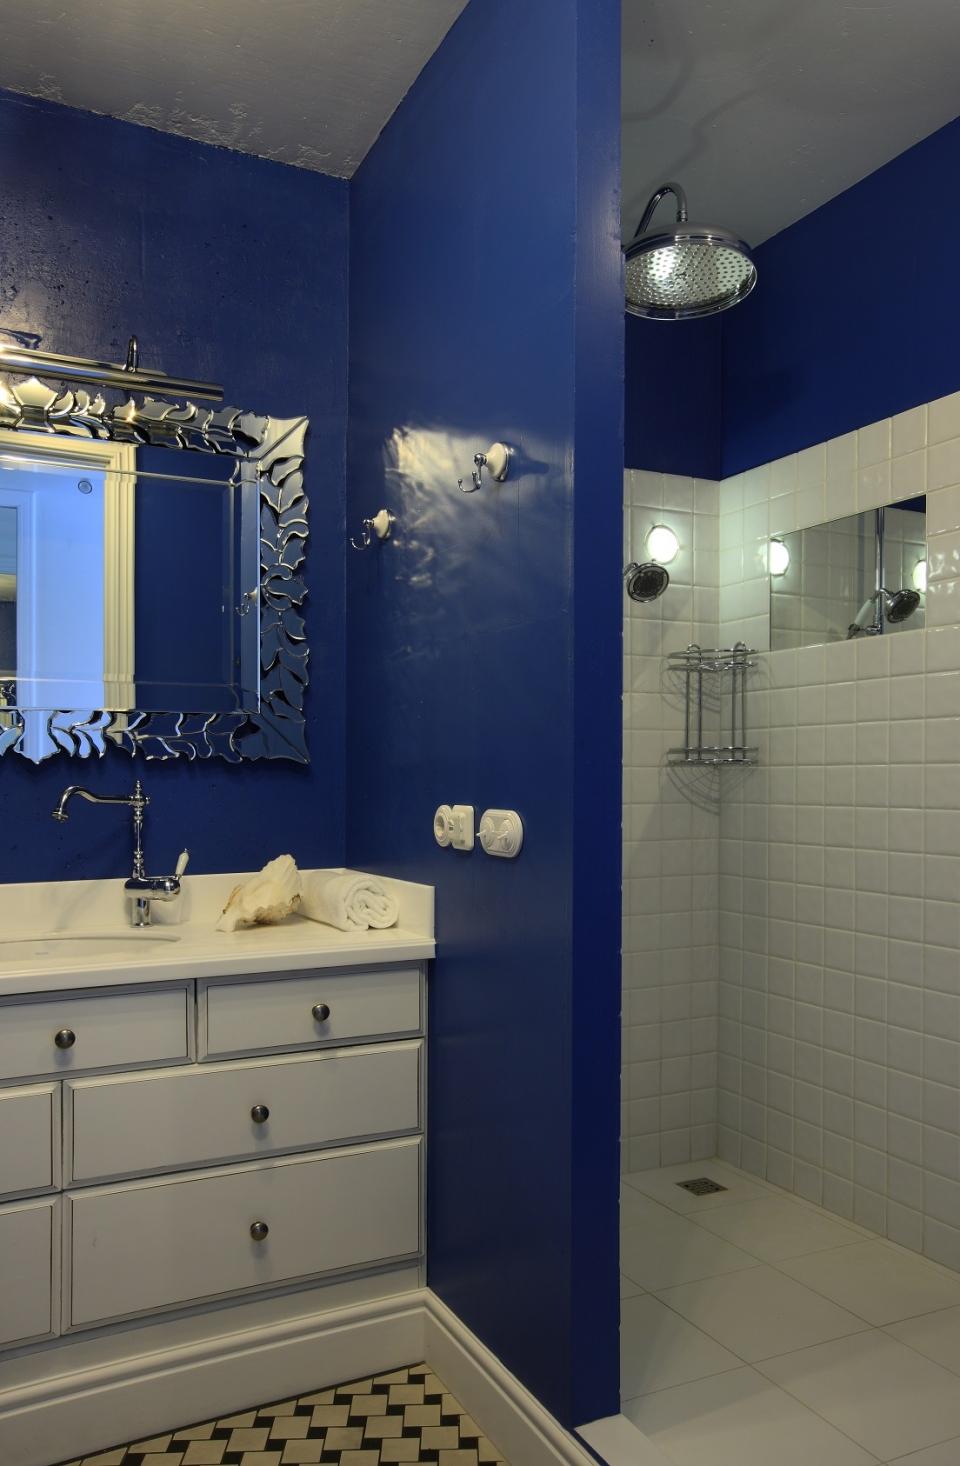 Синяя глянцевая краска в ванной